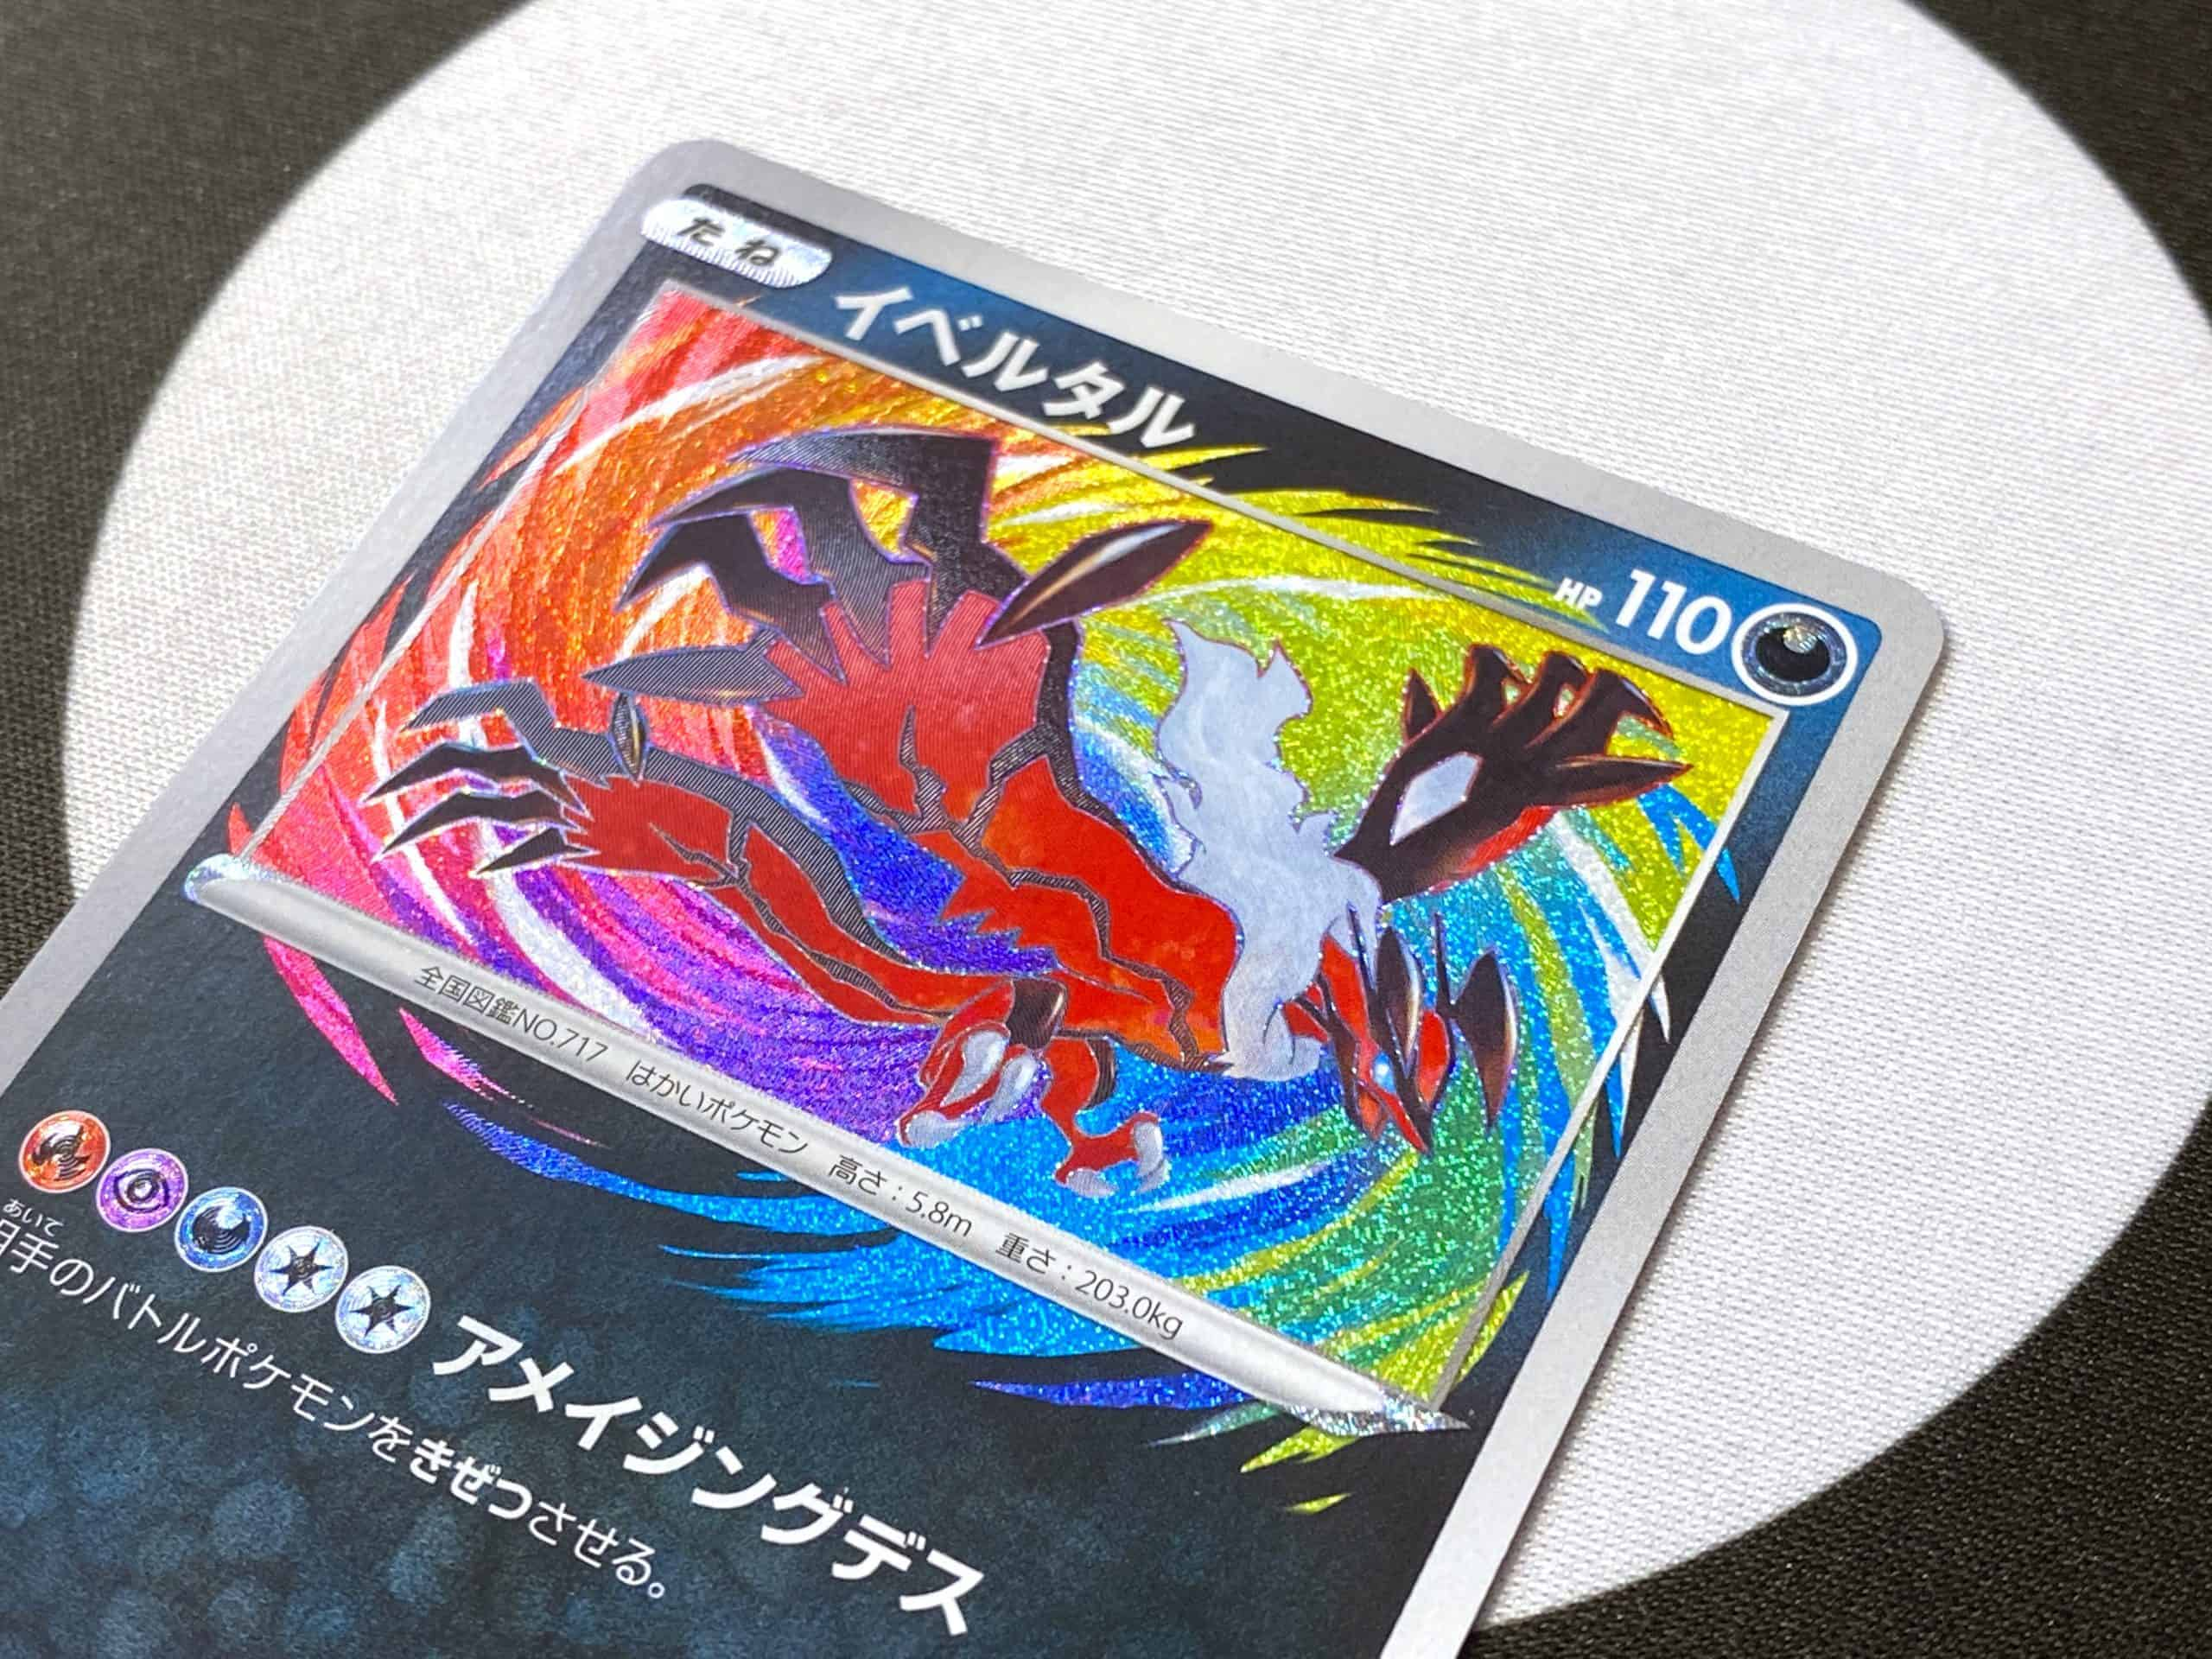 Shiny Star V Amazing Rare Card Yveltal S4a 117-190 Side Pokémon TCG